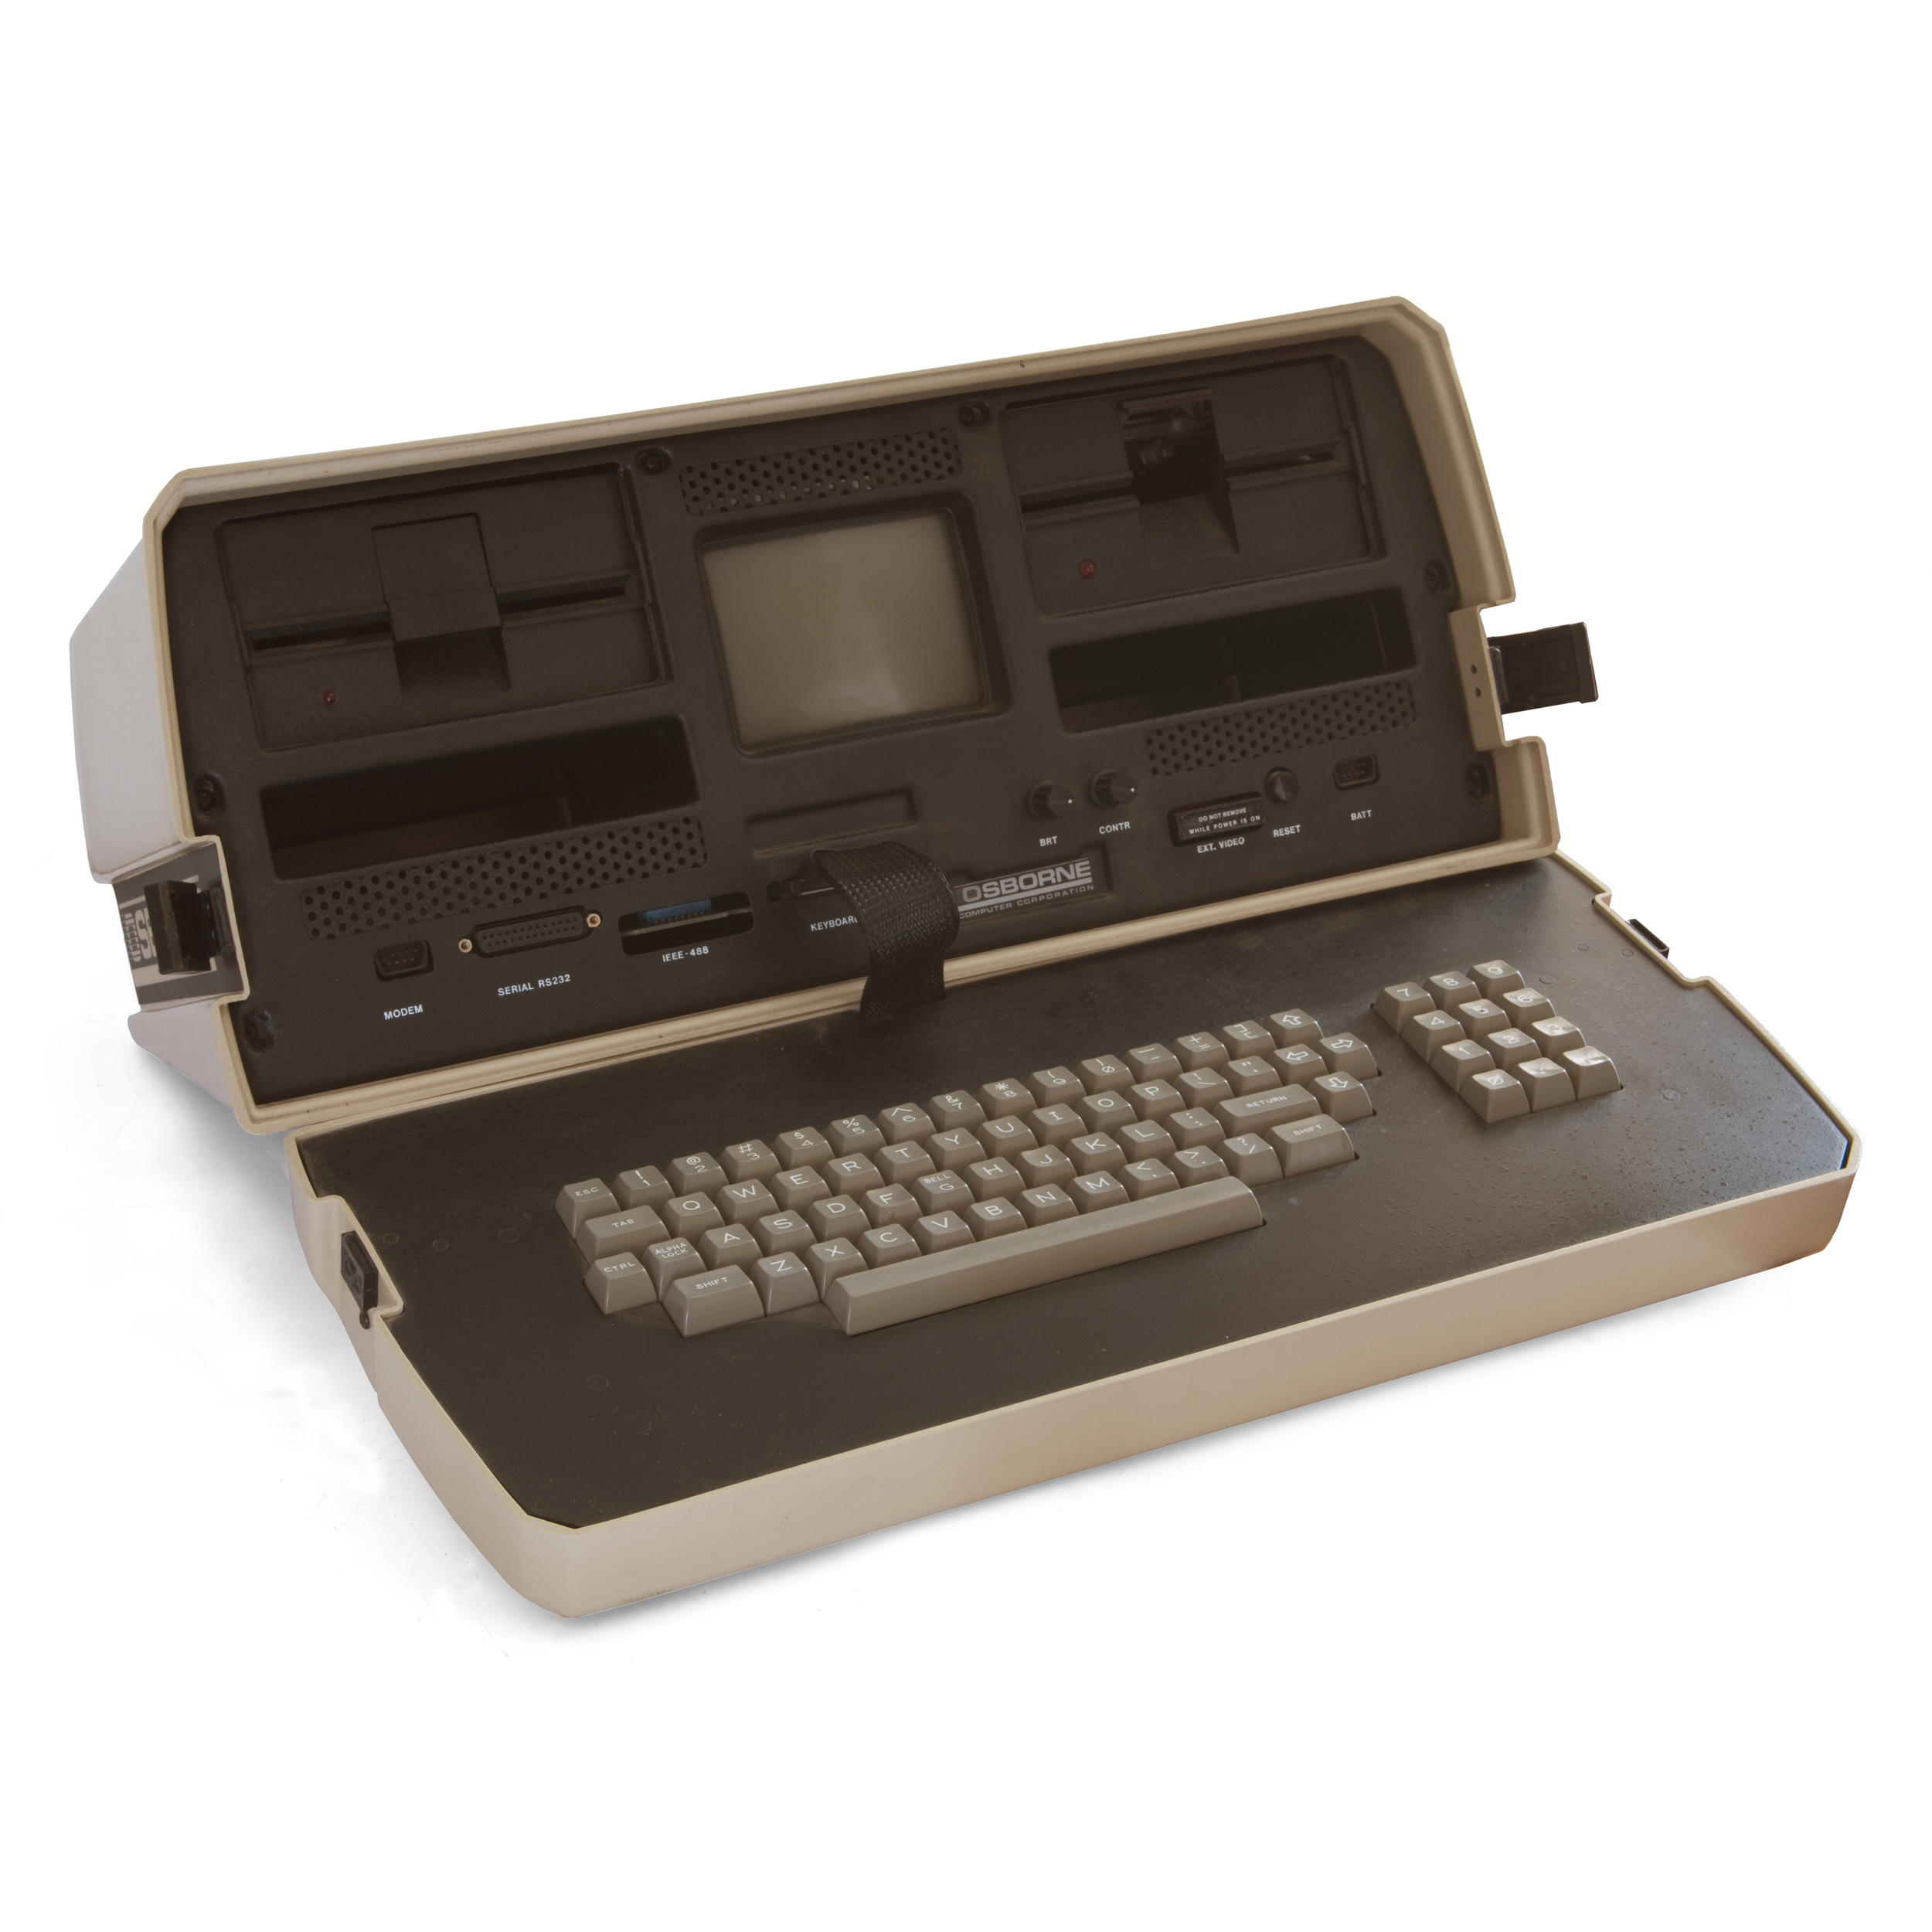 "Osborne 1, 23-lb. ""laptop"" computer,circa 1983"